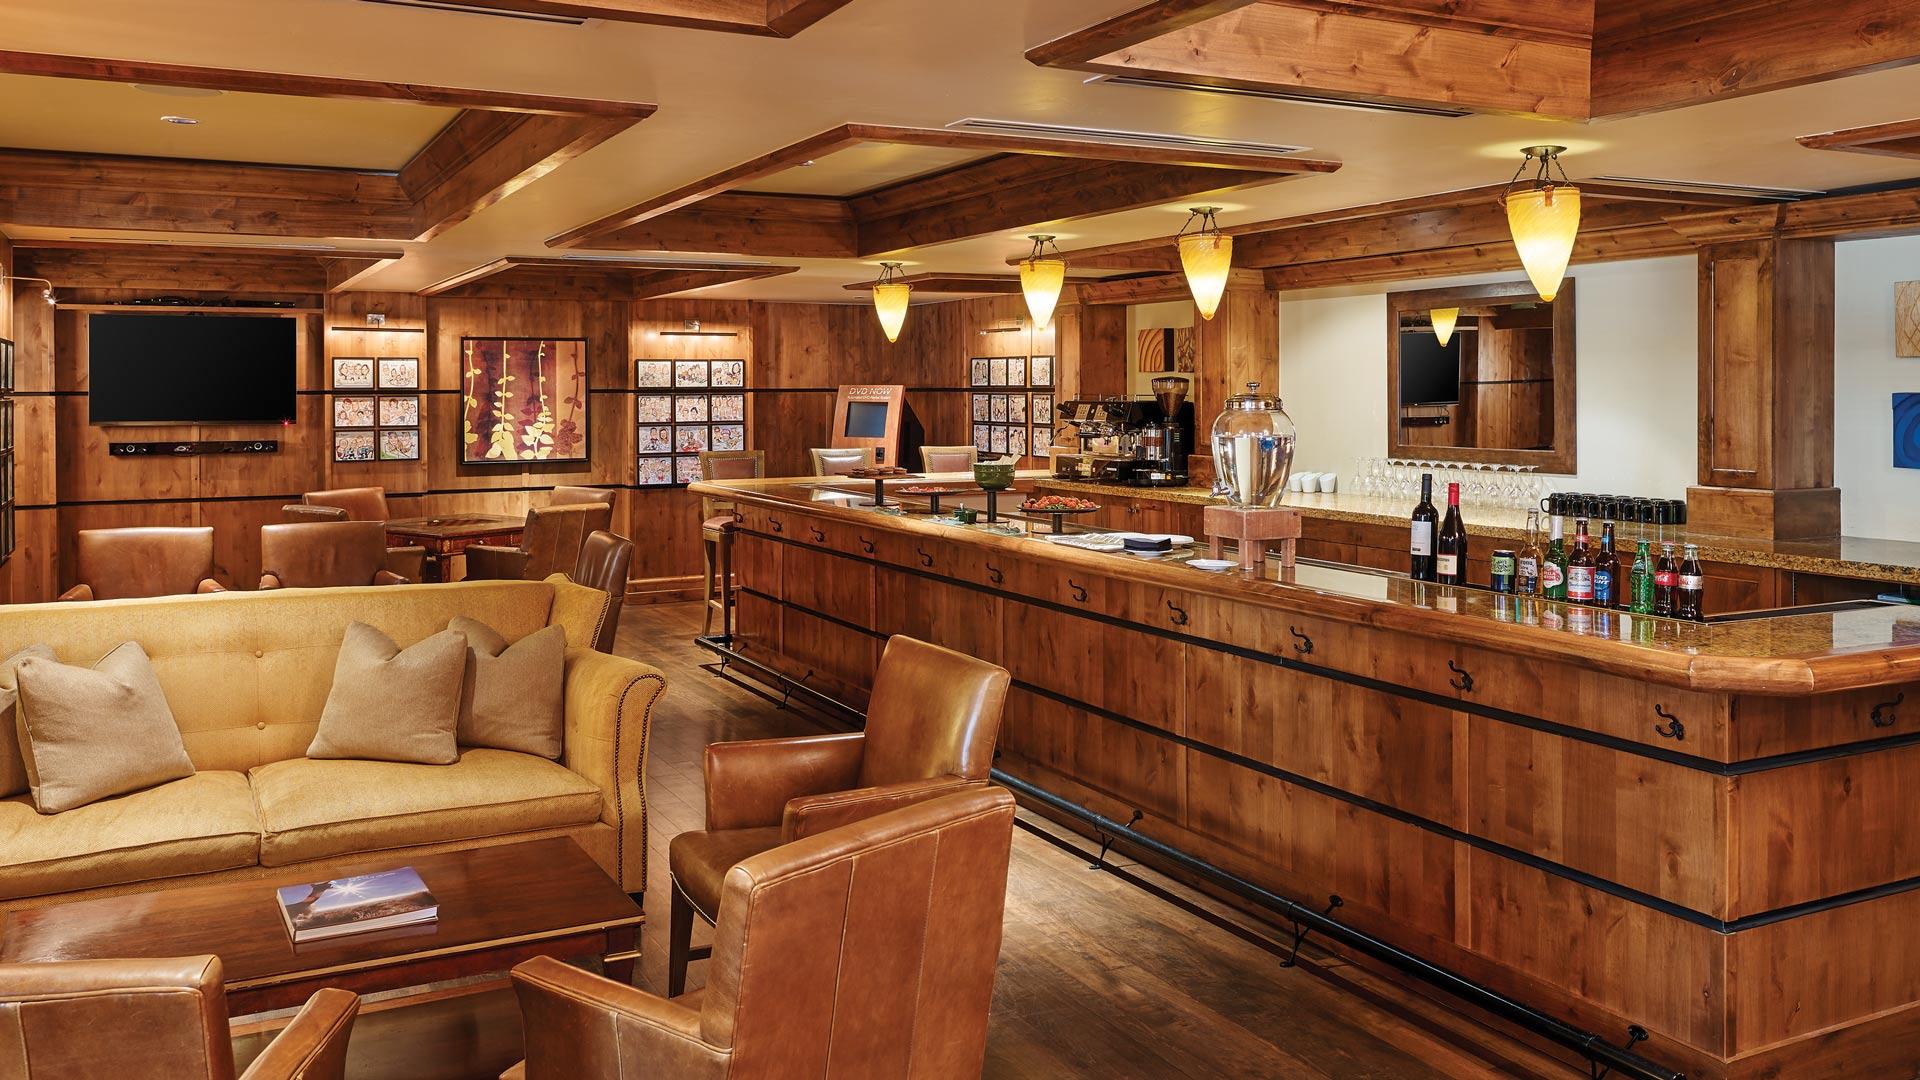 Sebastian-Vail-Gallery-Amenities-Owners-Lounge